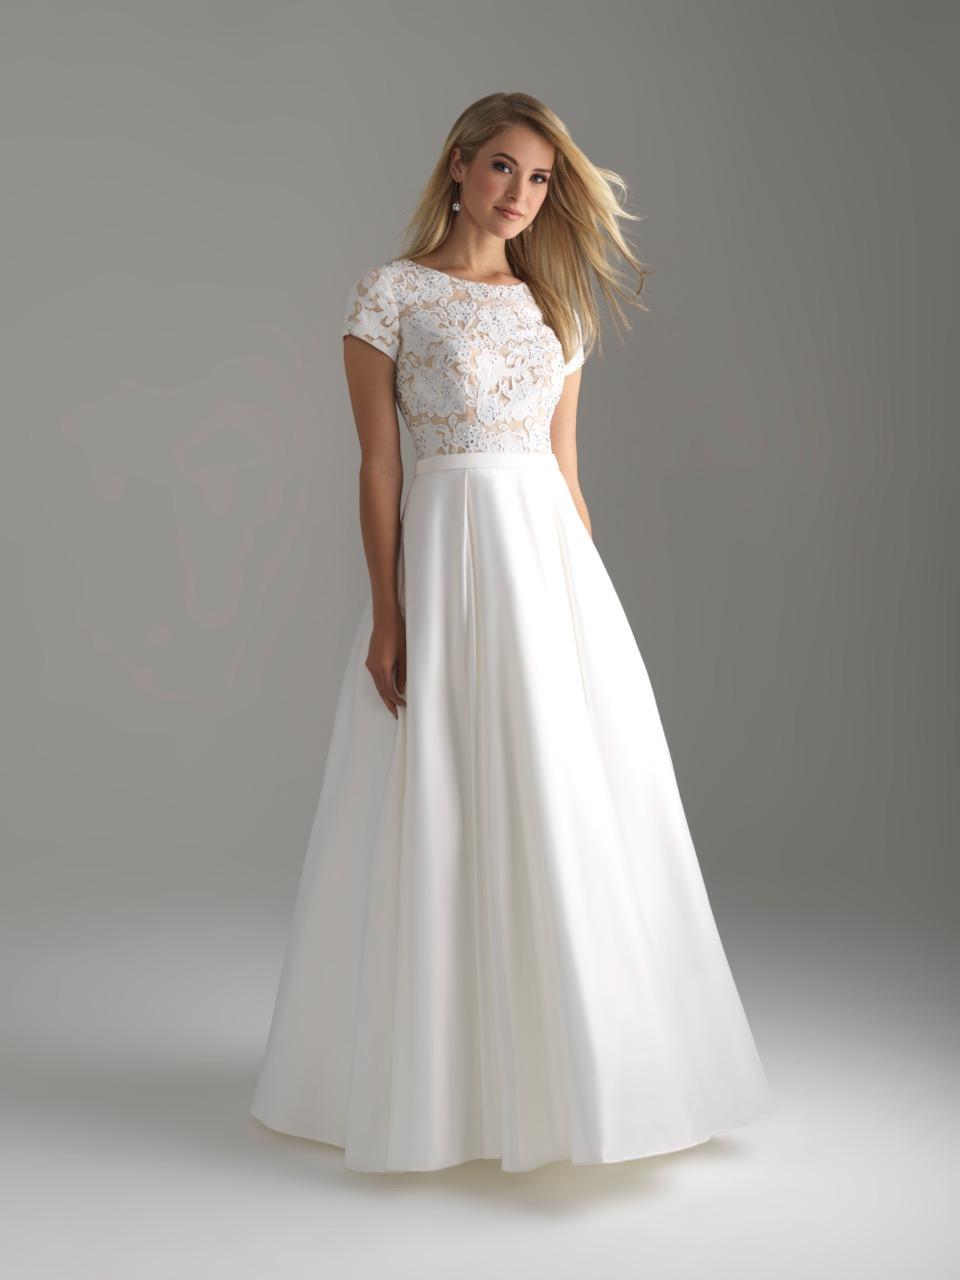 Allure 18-804M White Modest Prom